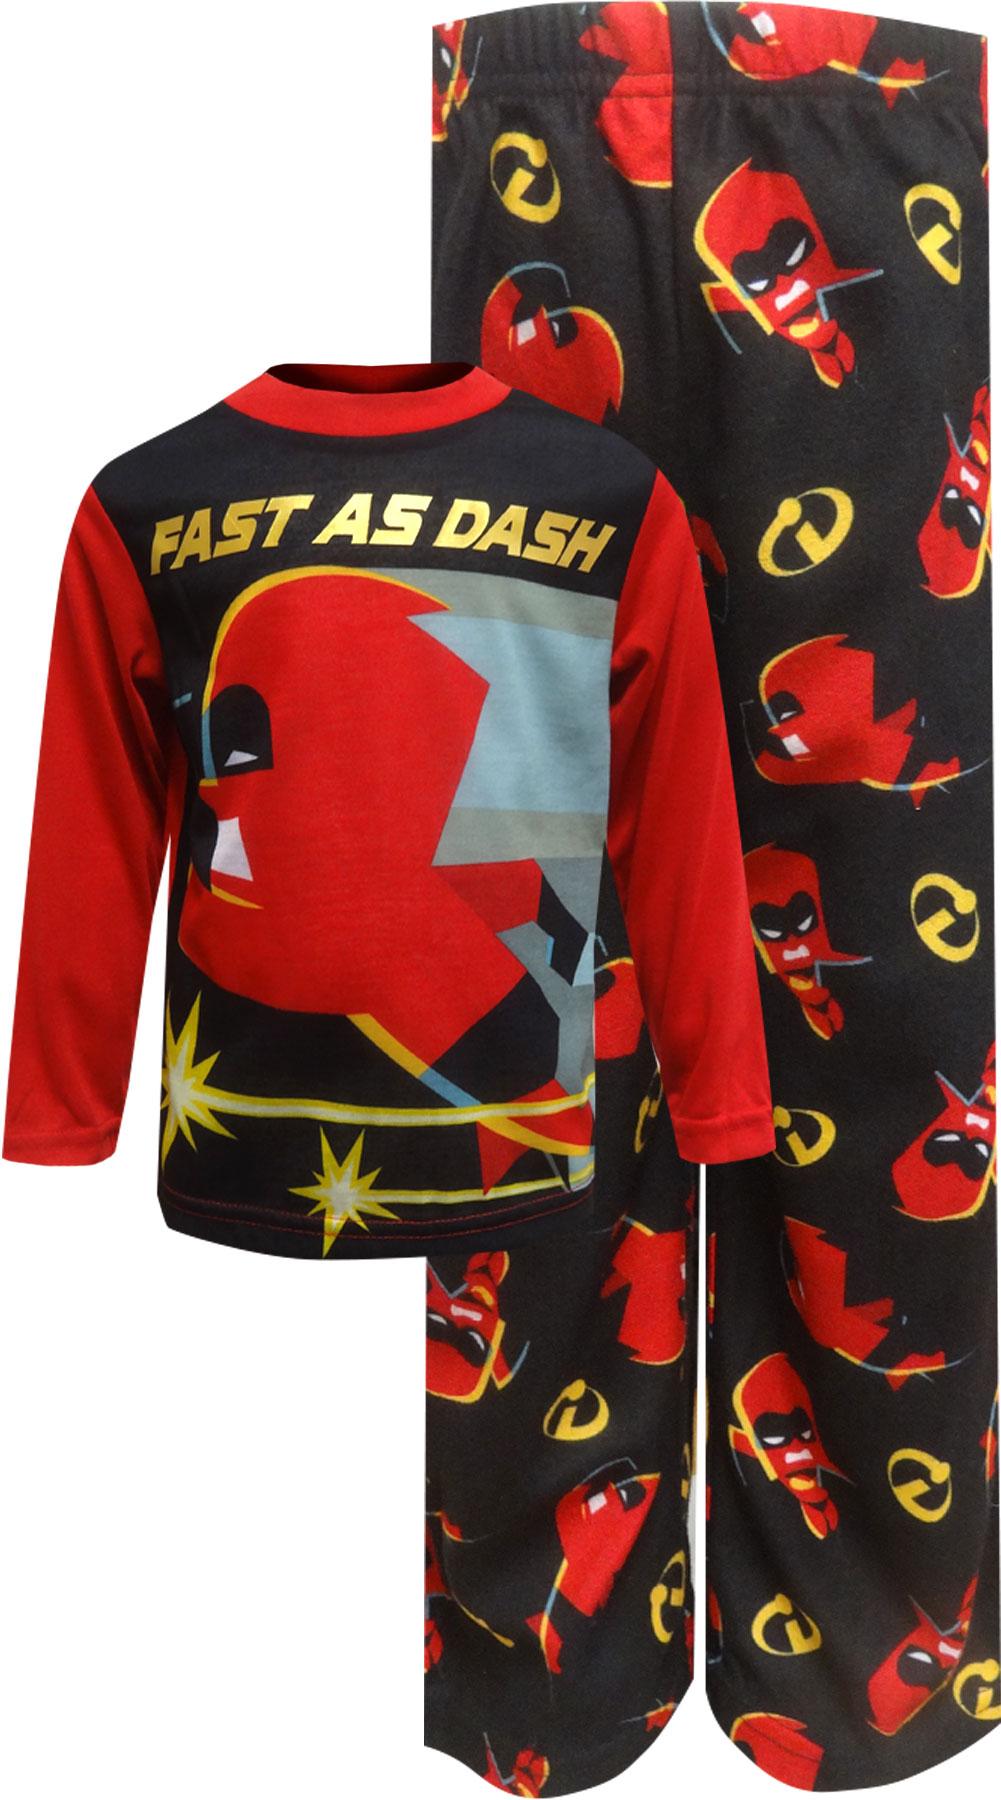 Image of Incredibles Fast as Dash Long Sleeve Pajamas for boys